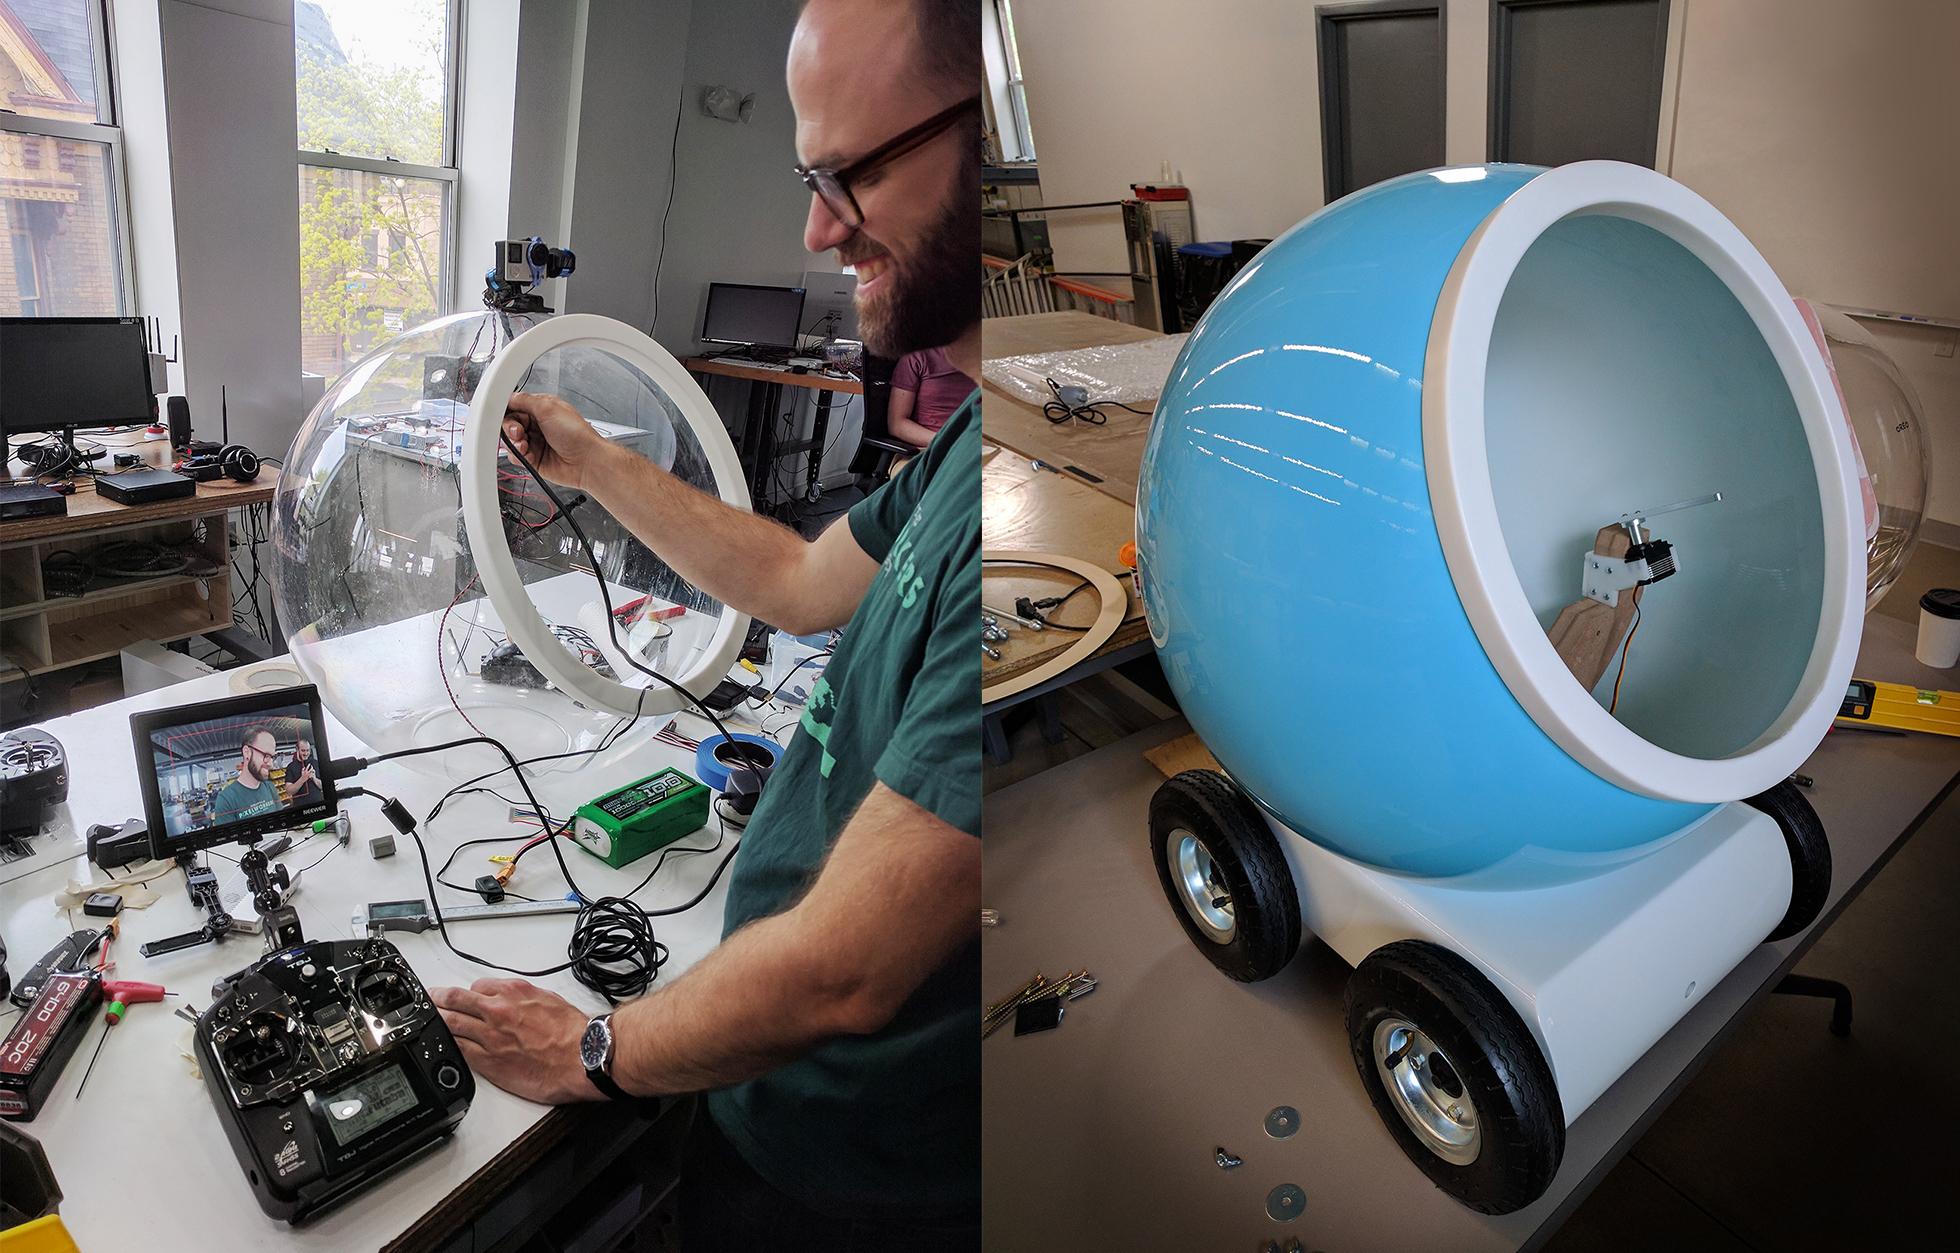 Iontank - Oreo WonderBot